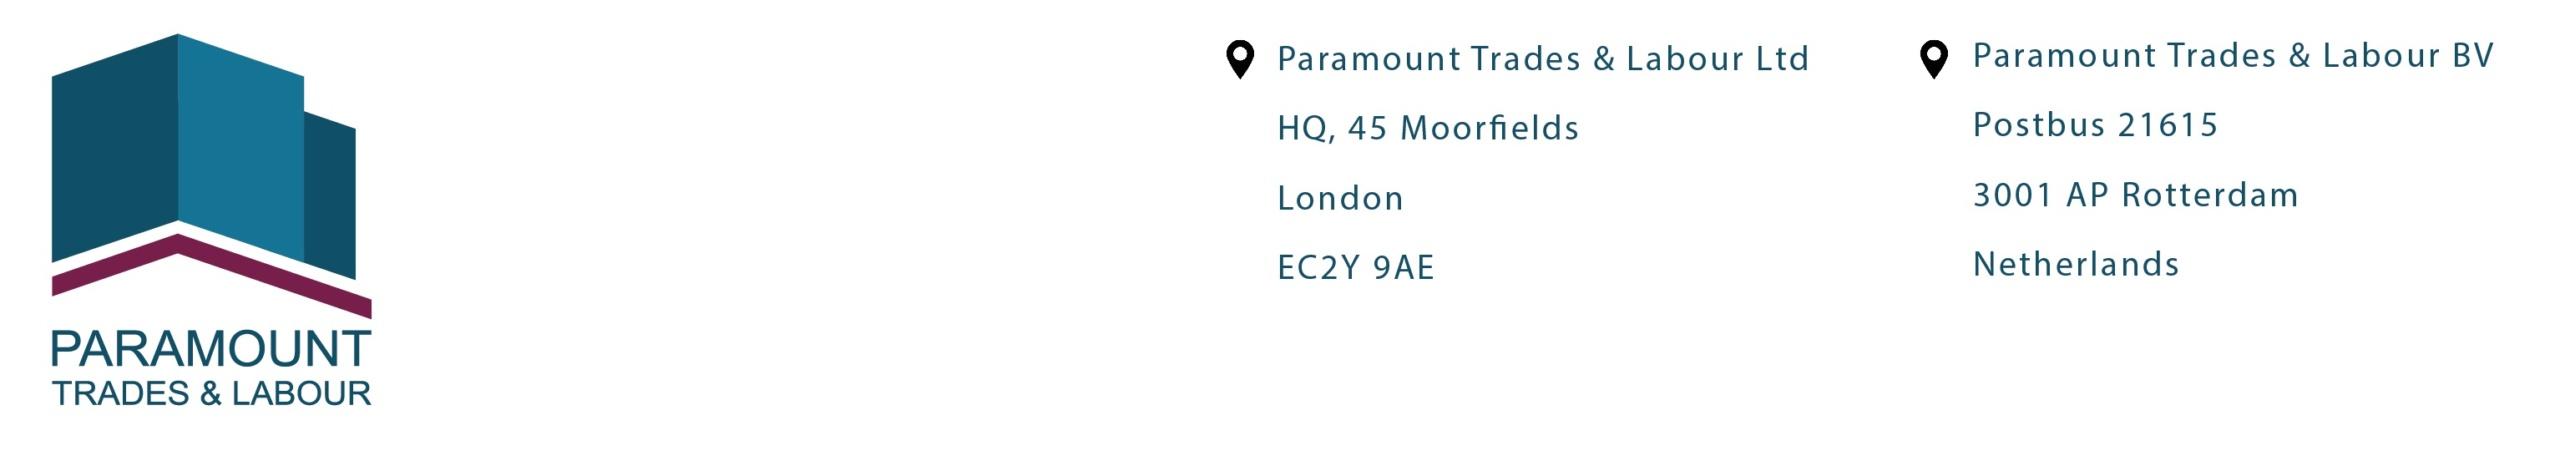 Paramount Trades & Labour